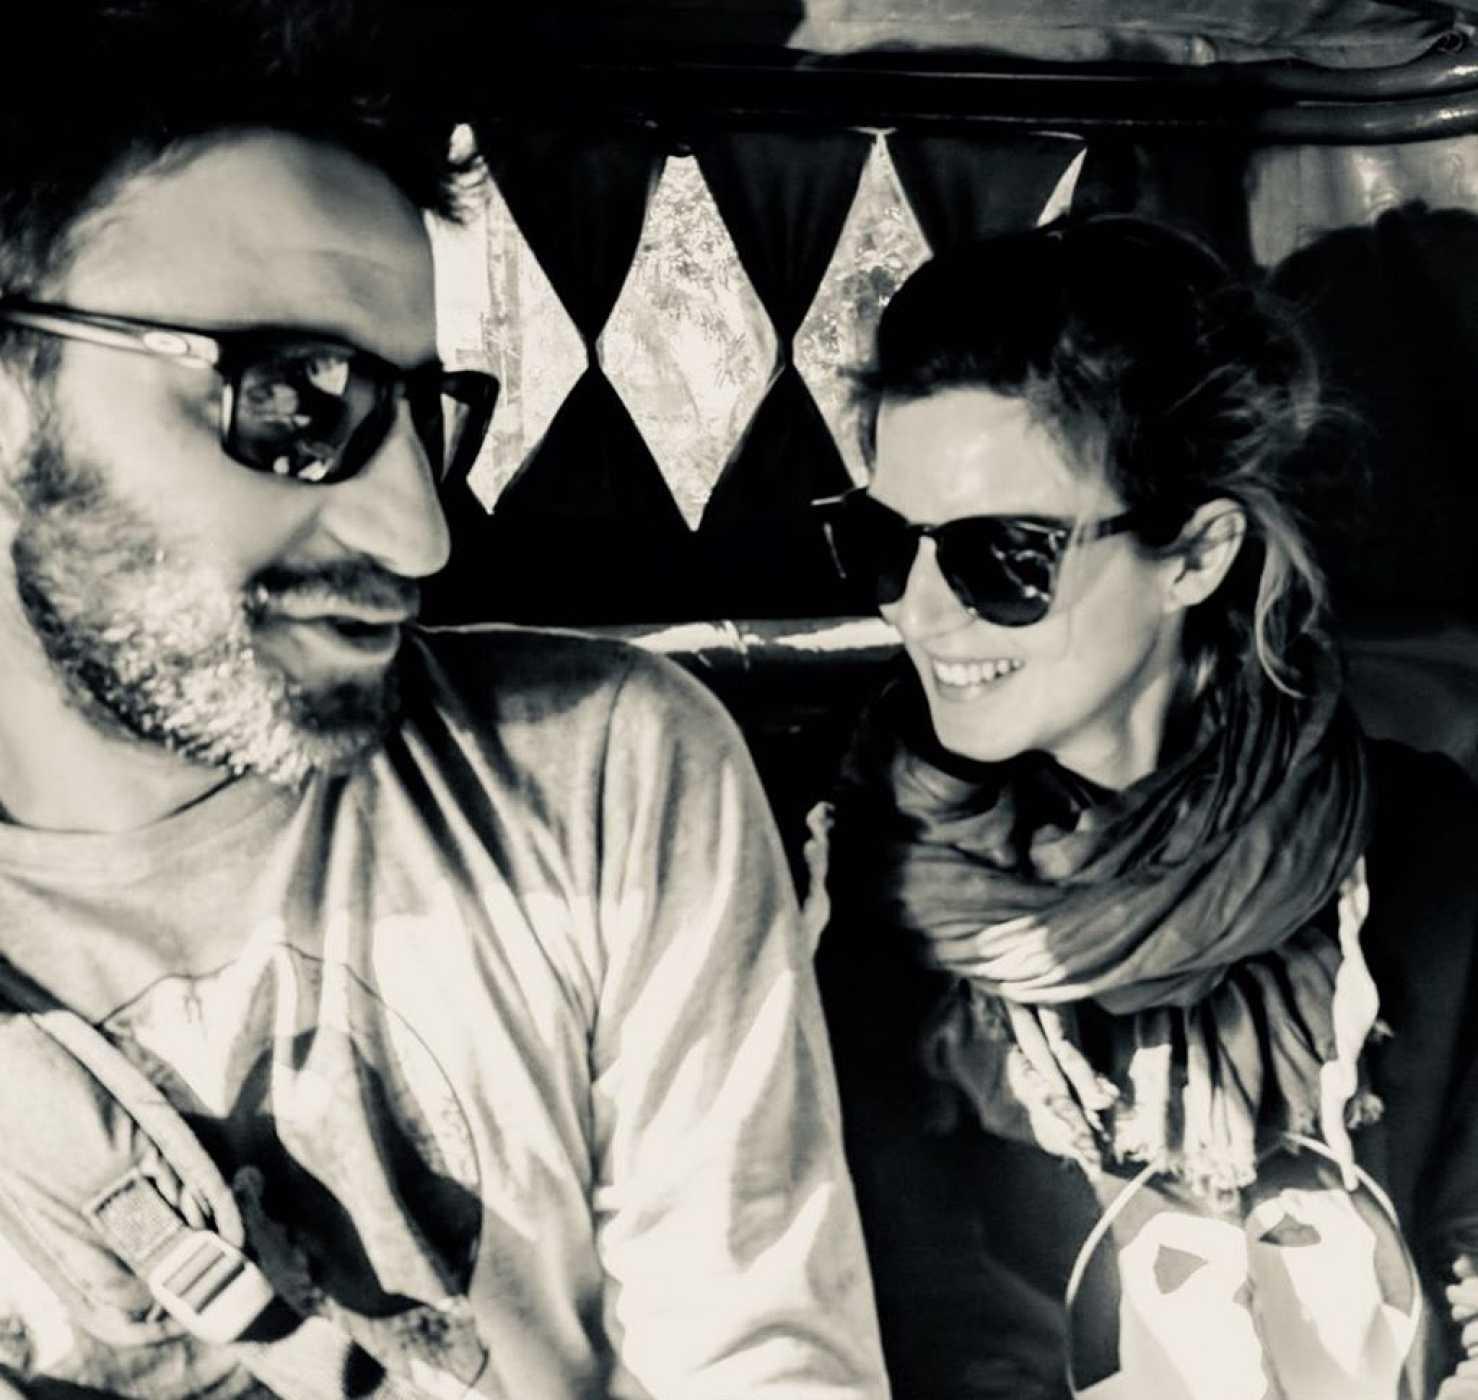 Corazón - Dani Rovira y Clara Lago en Roma: ¿posible reconciliación?